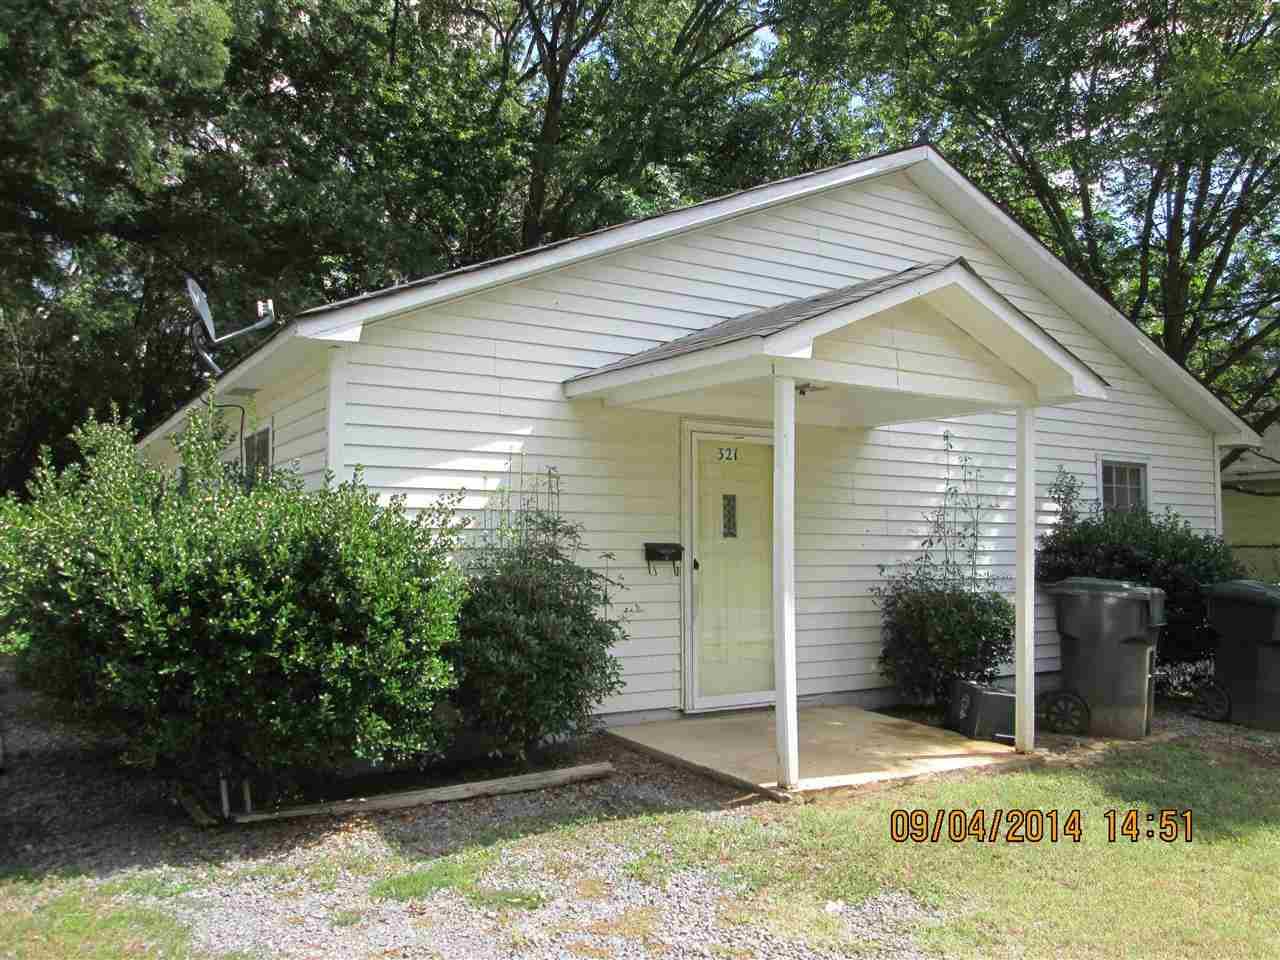 Multi Family for Sale, ListingId:29912878, location: 321/323 S Jones Avenue Rock Hill 29730